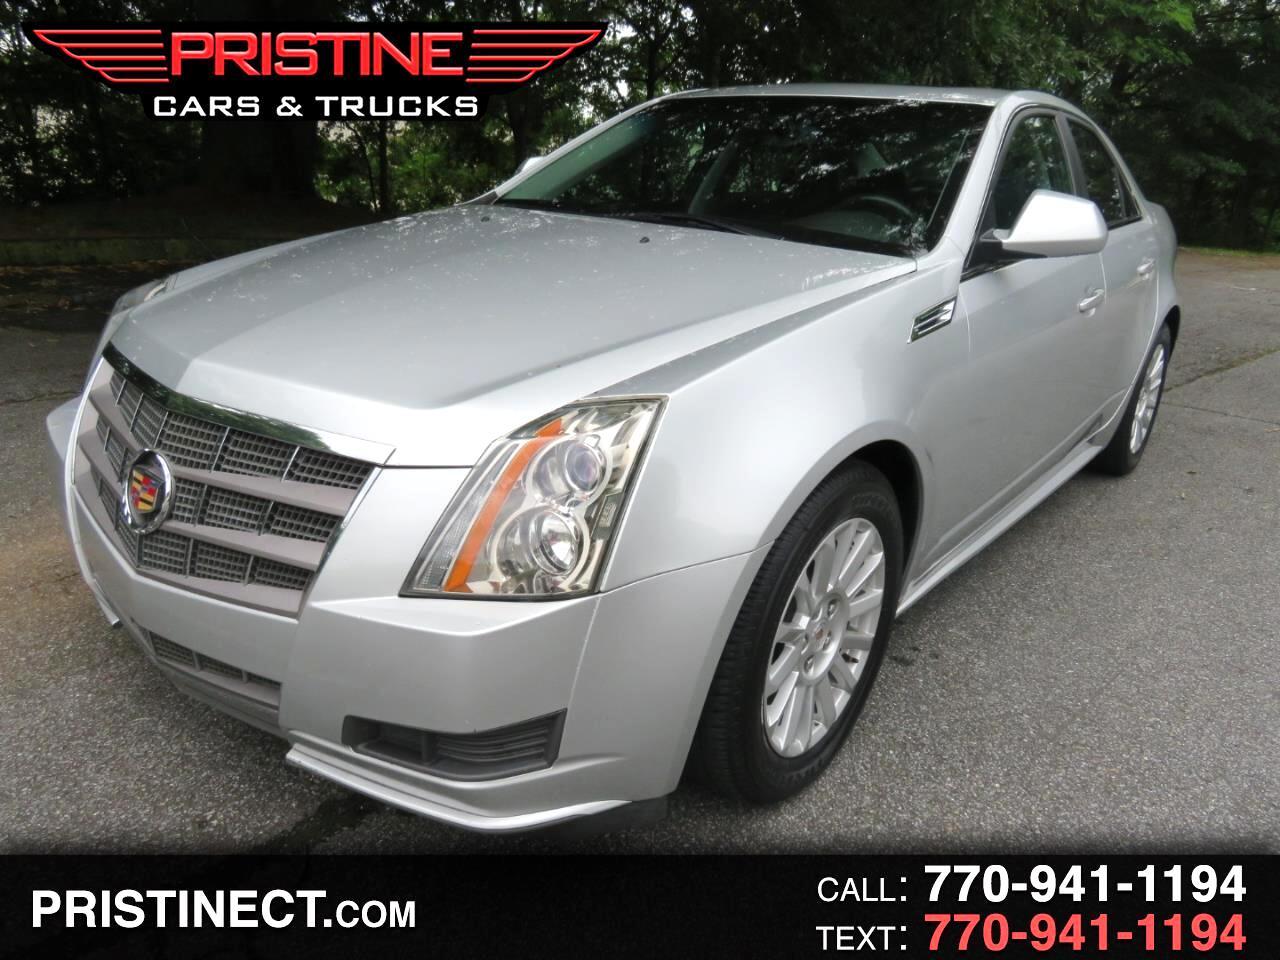 2010 Cadillac CTS Sedan 4dr Sdn 3.0L Luxury RWD